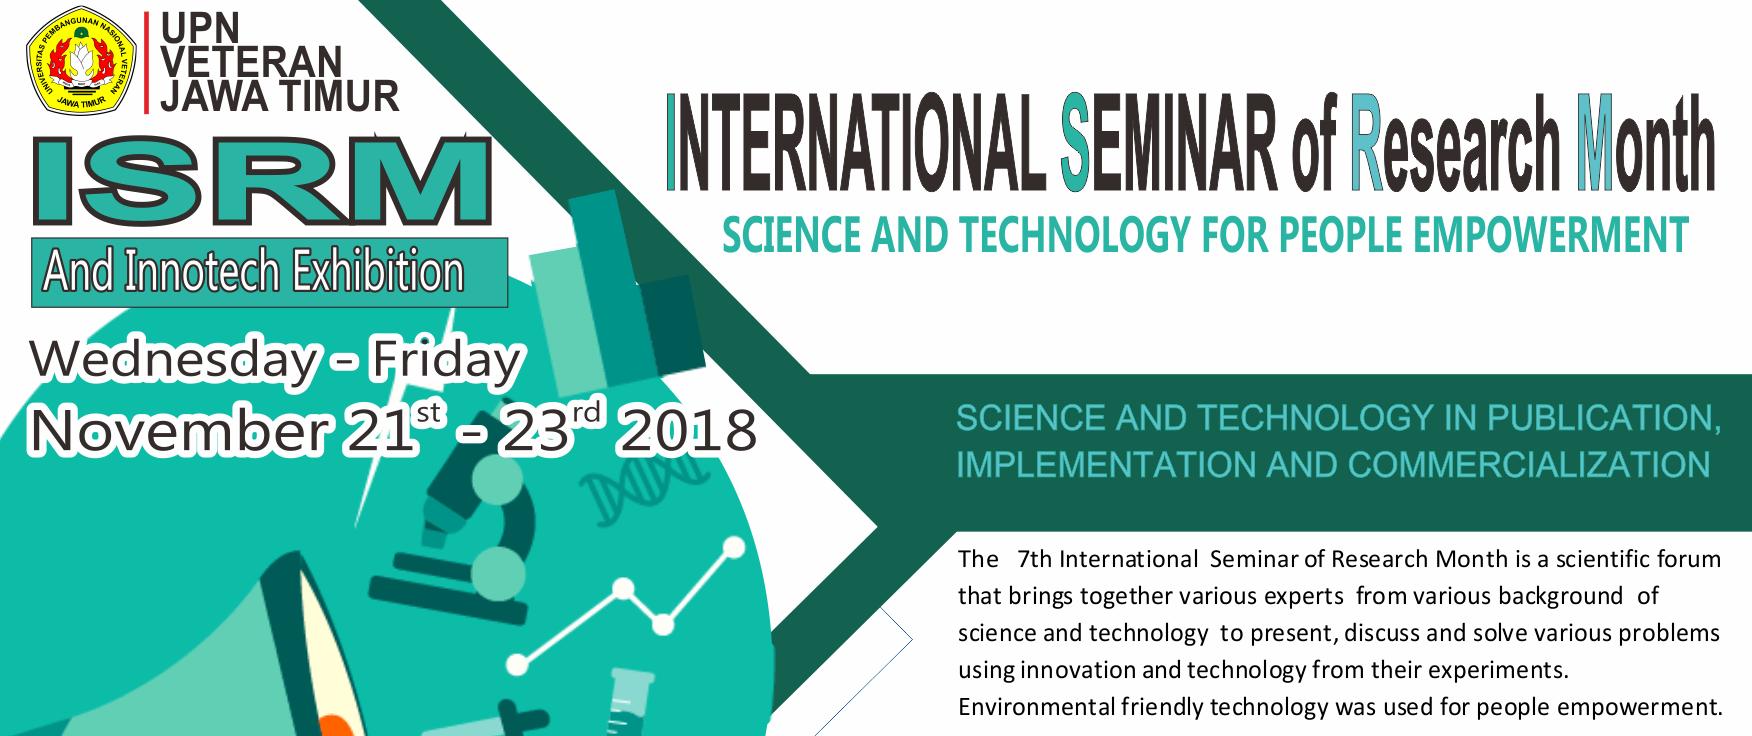 International Seminar of Research Month 2018